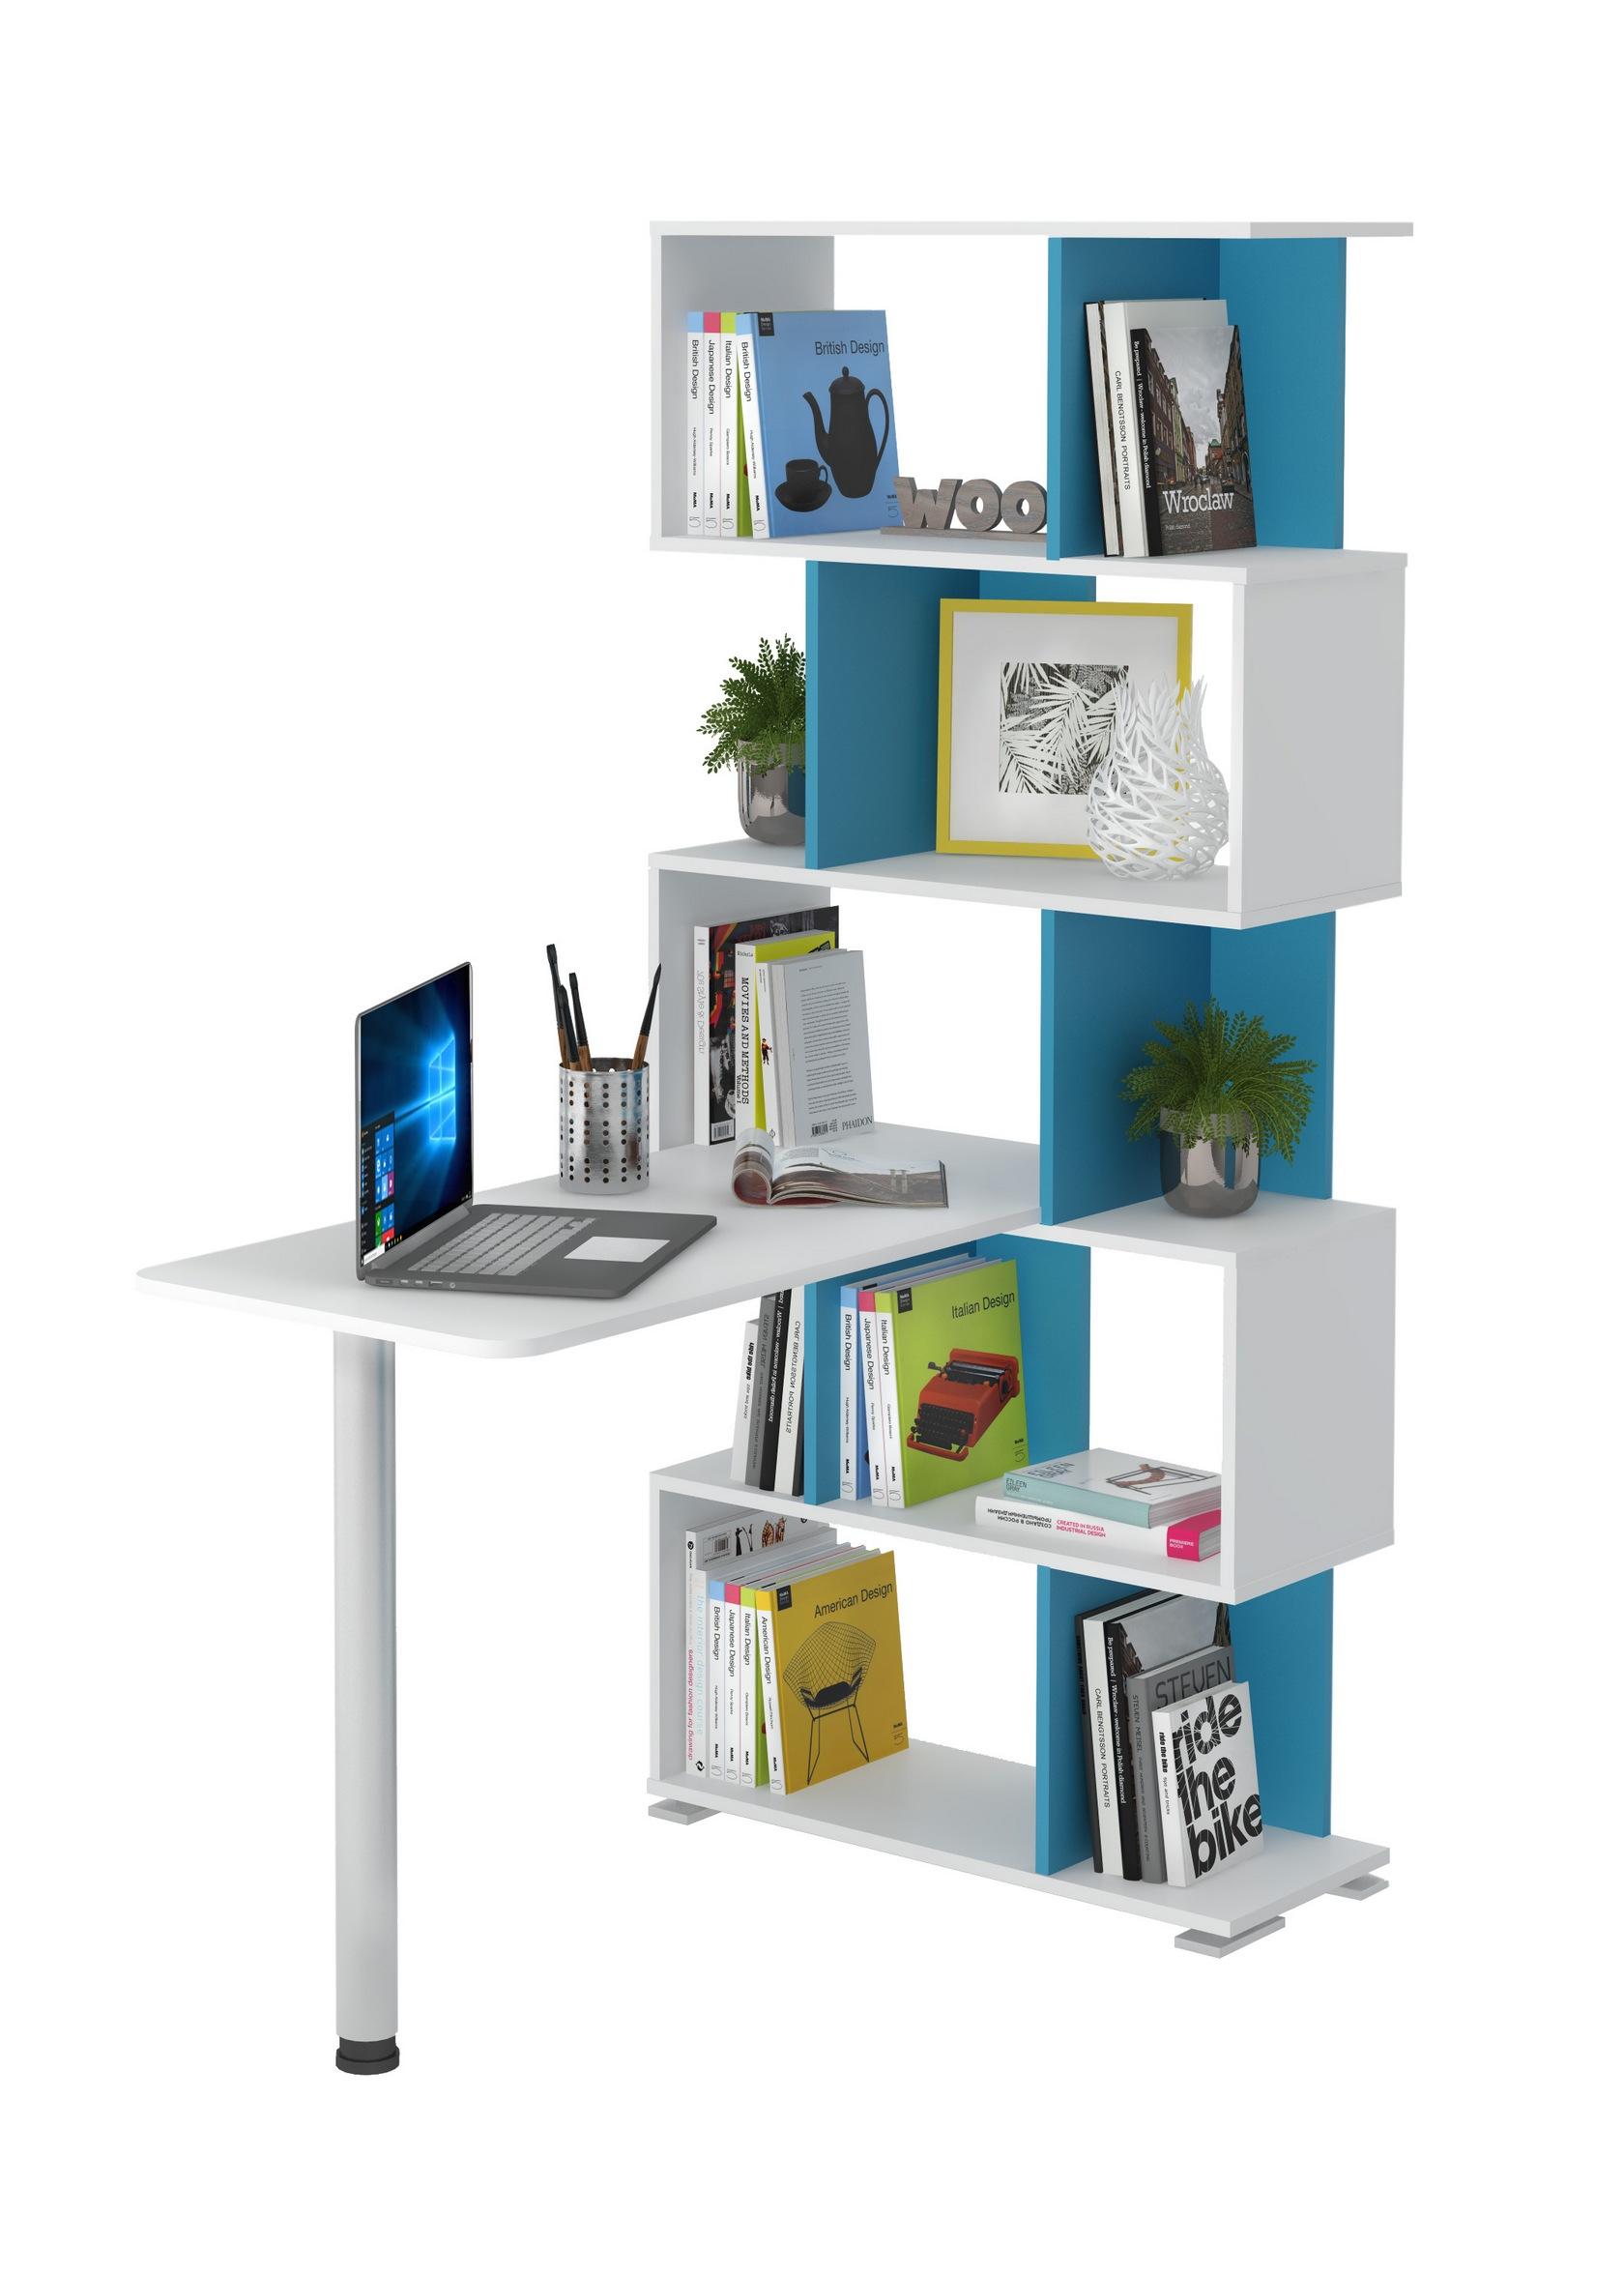 Угловой компьютерный стол мэрдэс сл-5ст белый жемчуг / синий.